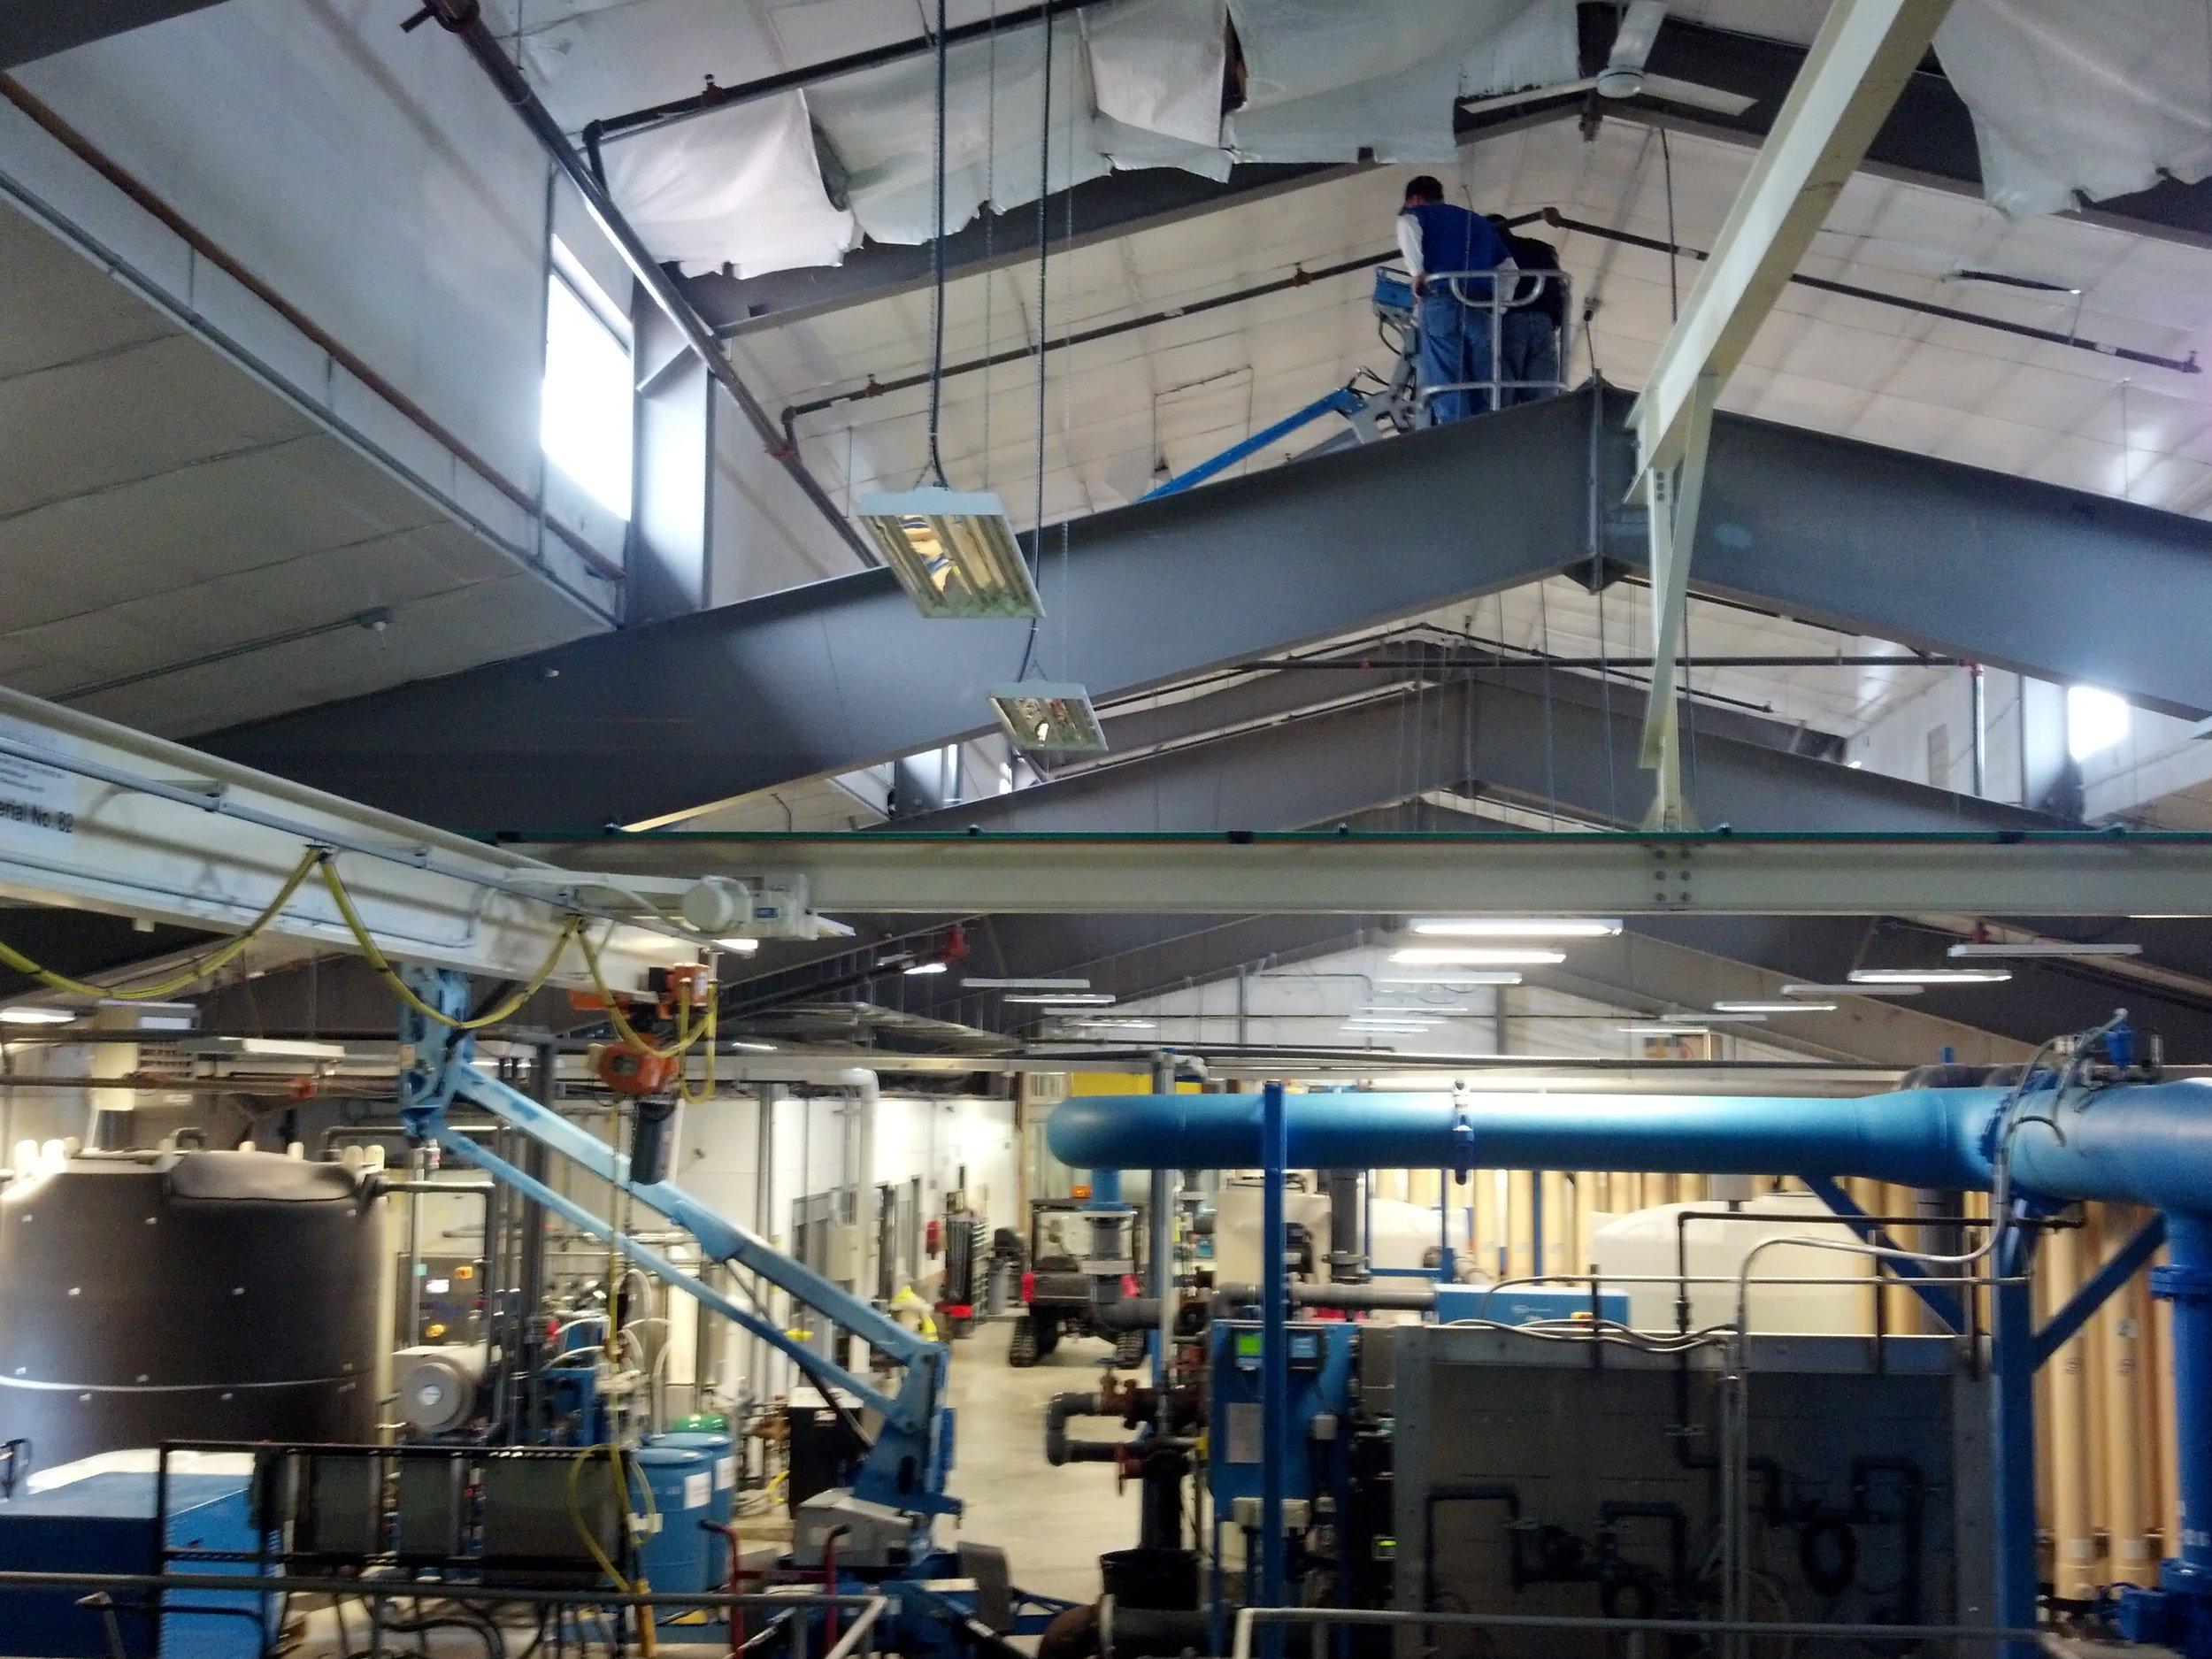 Operators repair a roof problem at the plant.